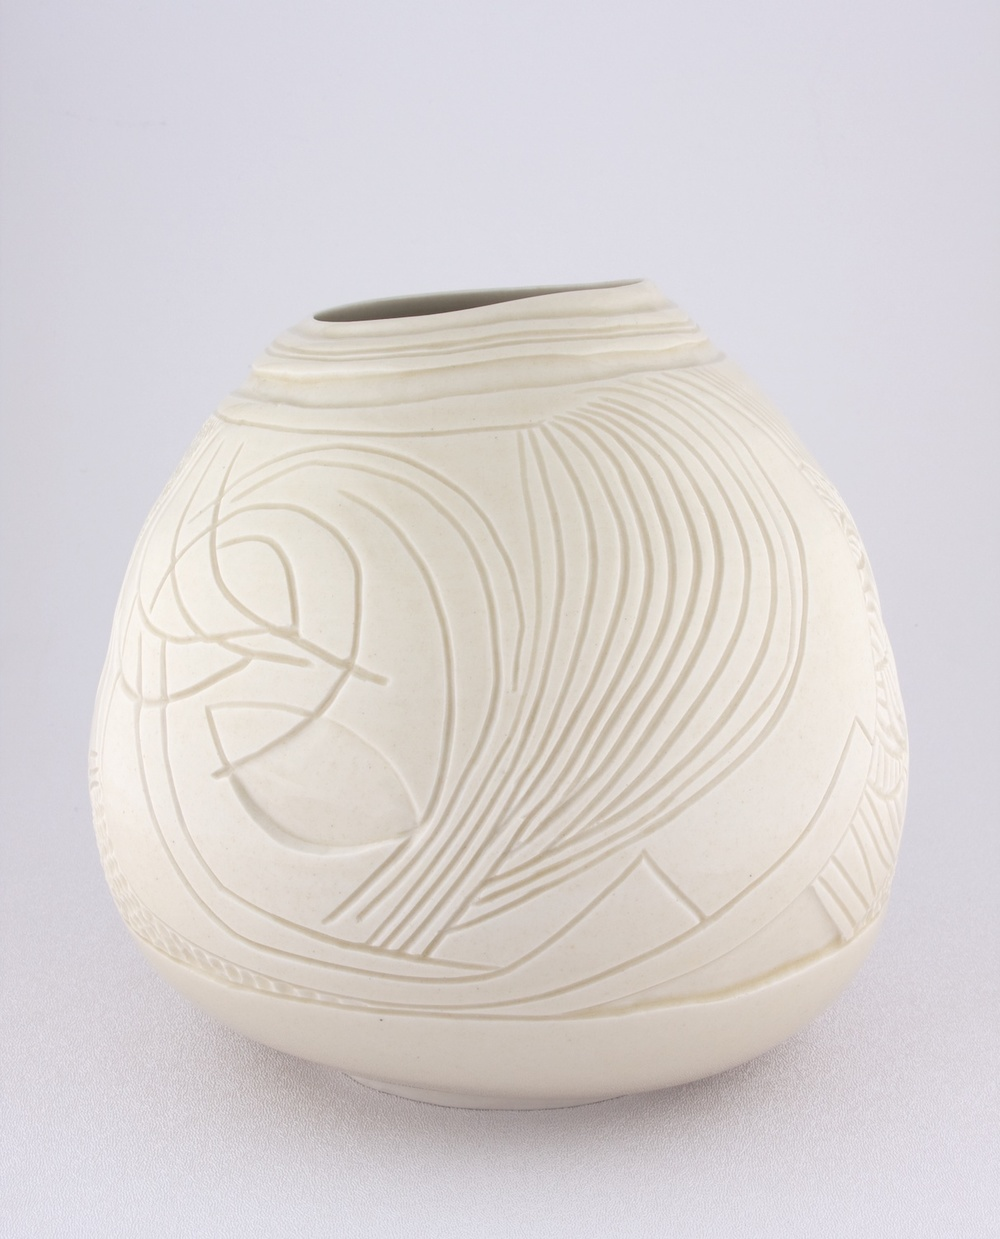 Shio Kusaka  Untitled (freestyle 2)  2009 Porcelain 7 ½h x 7 ¼w in SK047